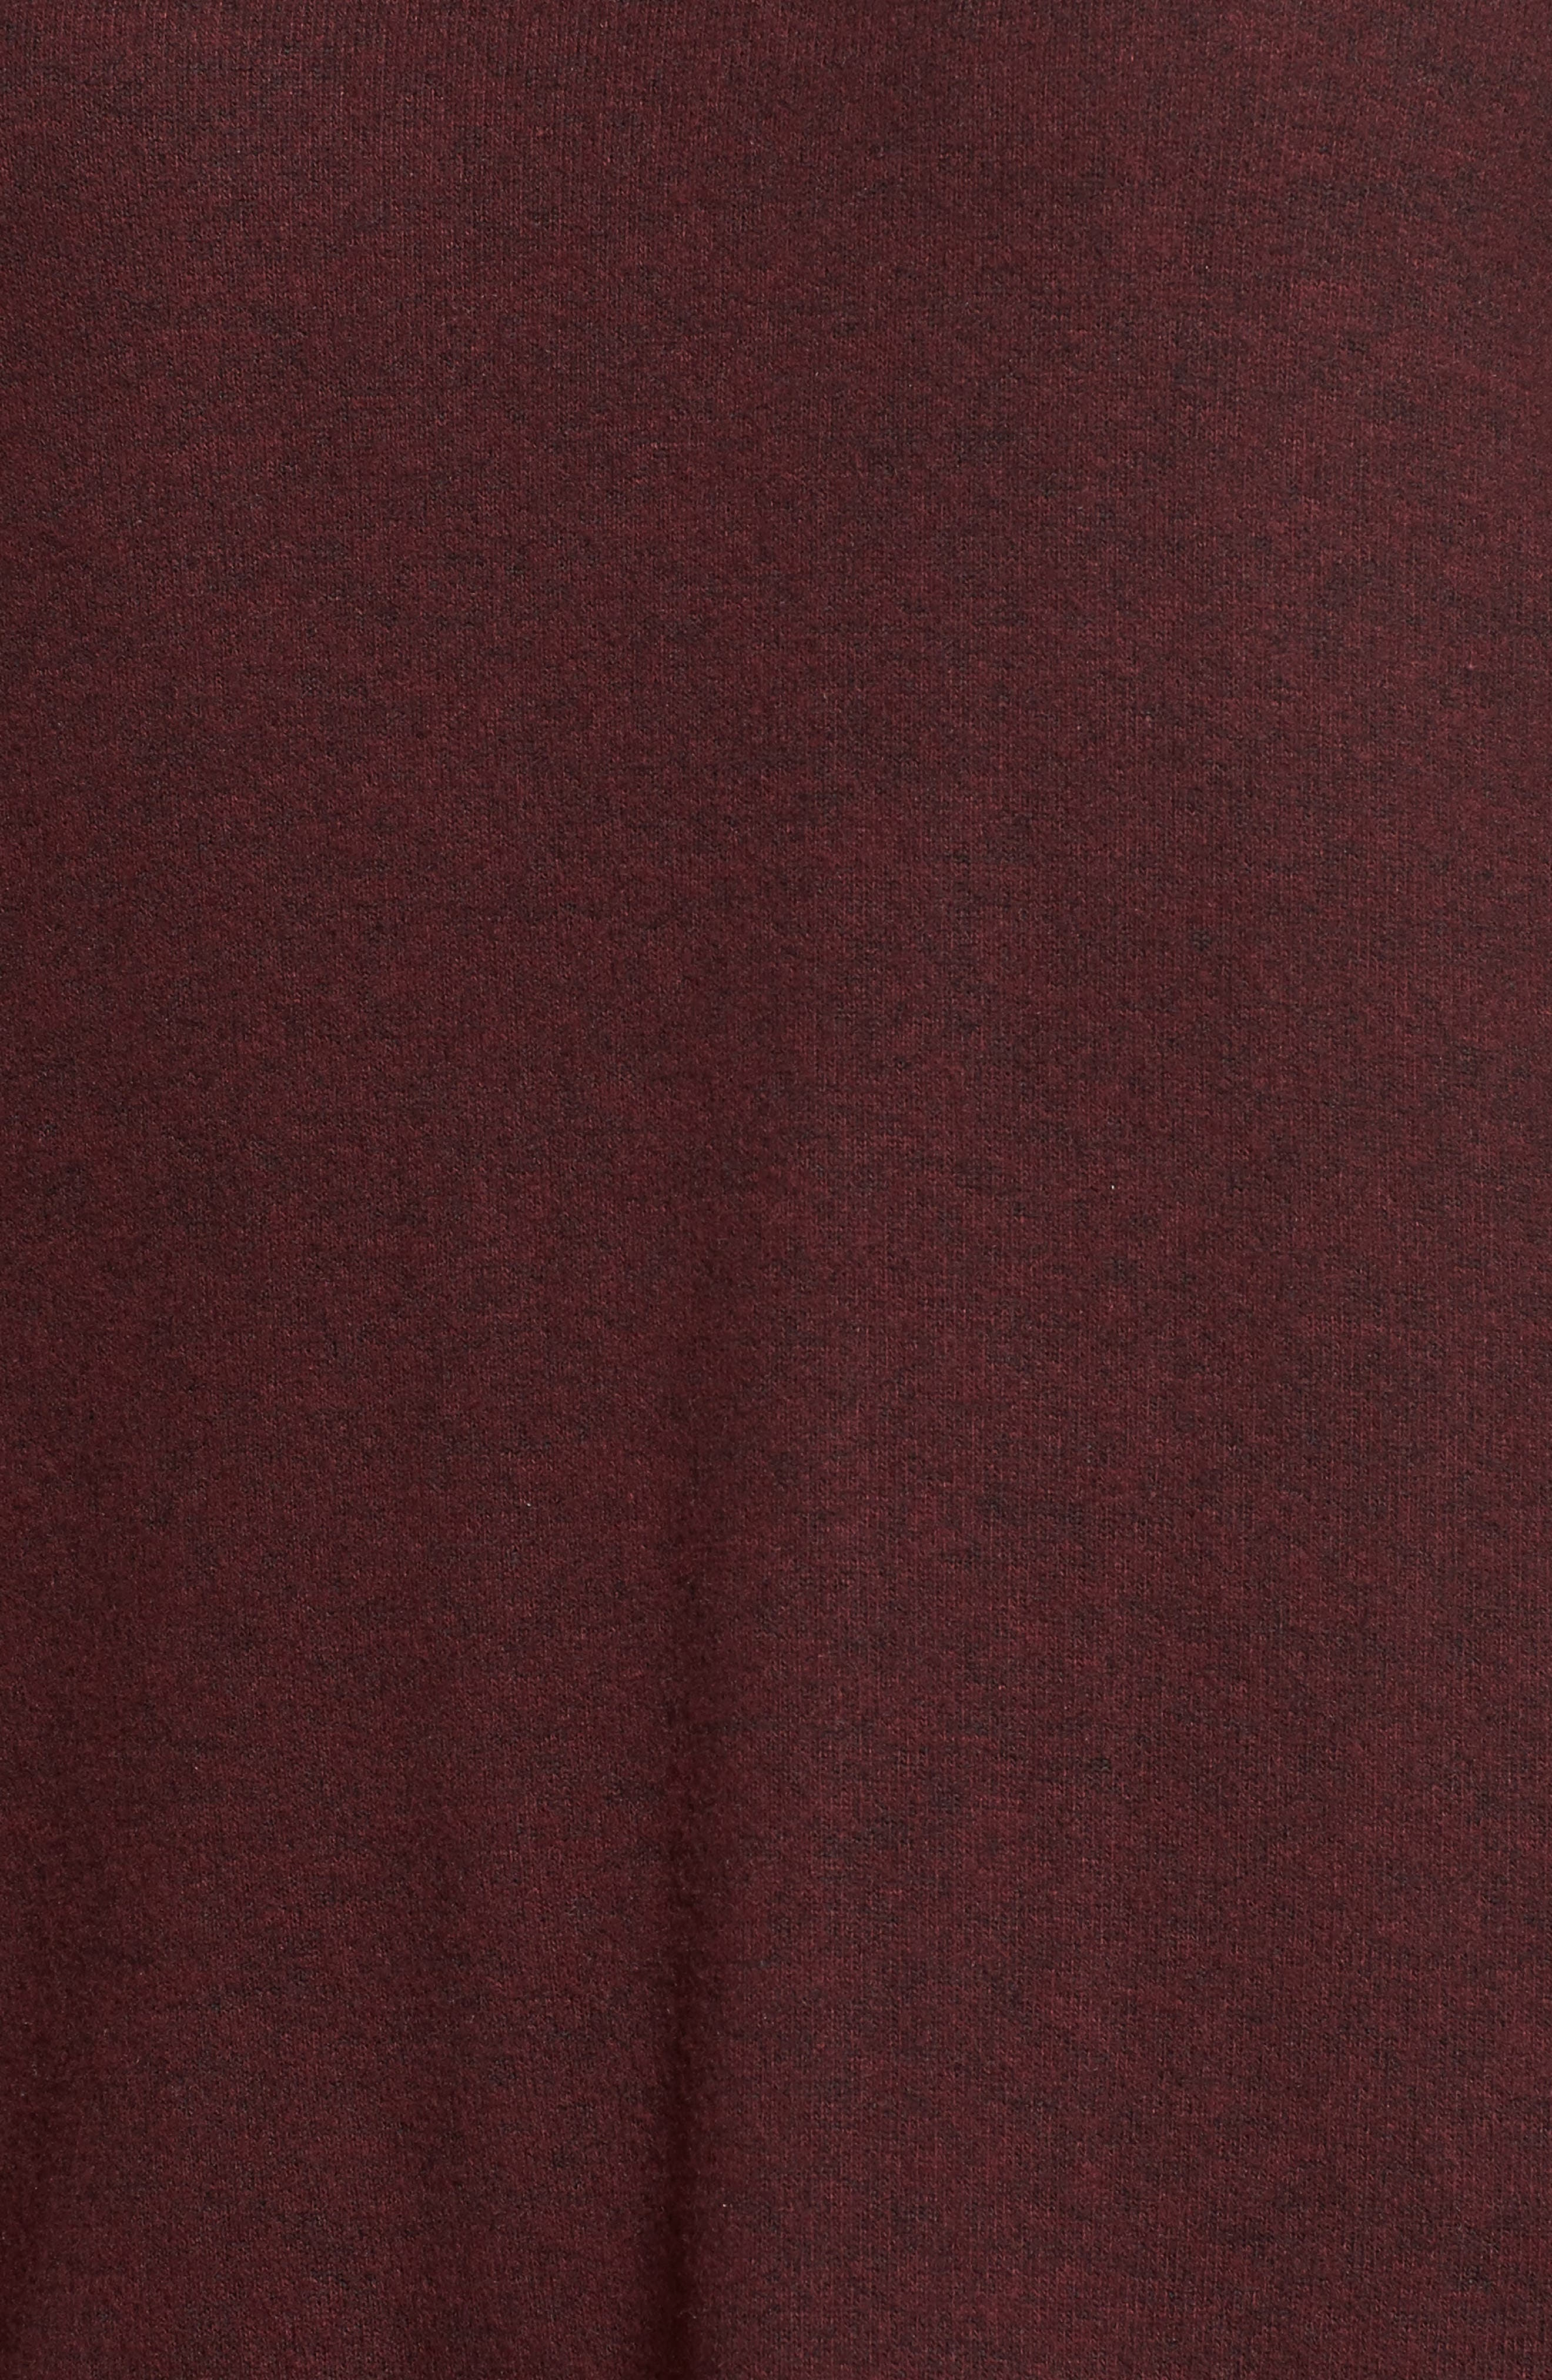 Bell Sleeve Cozy Fleece Pullover,                             Alternate thumbnail 60, color,